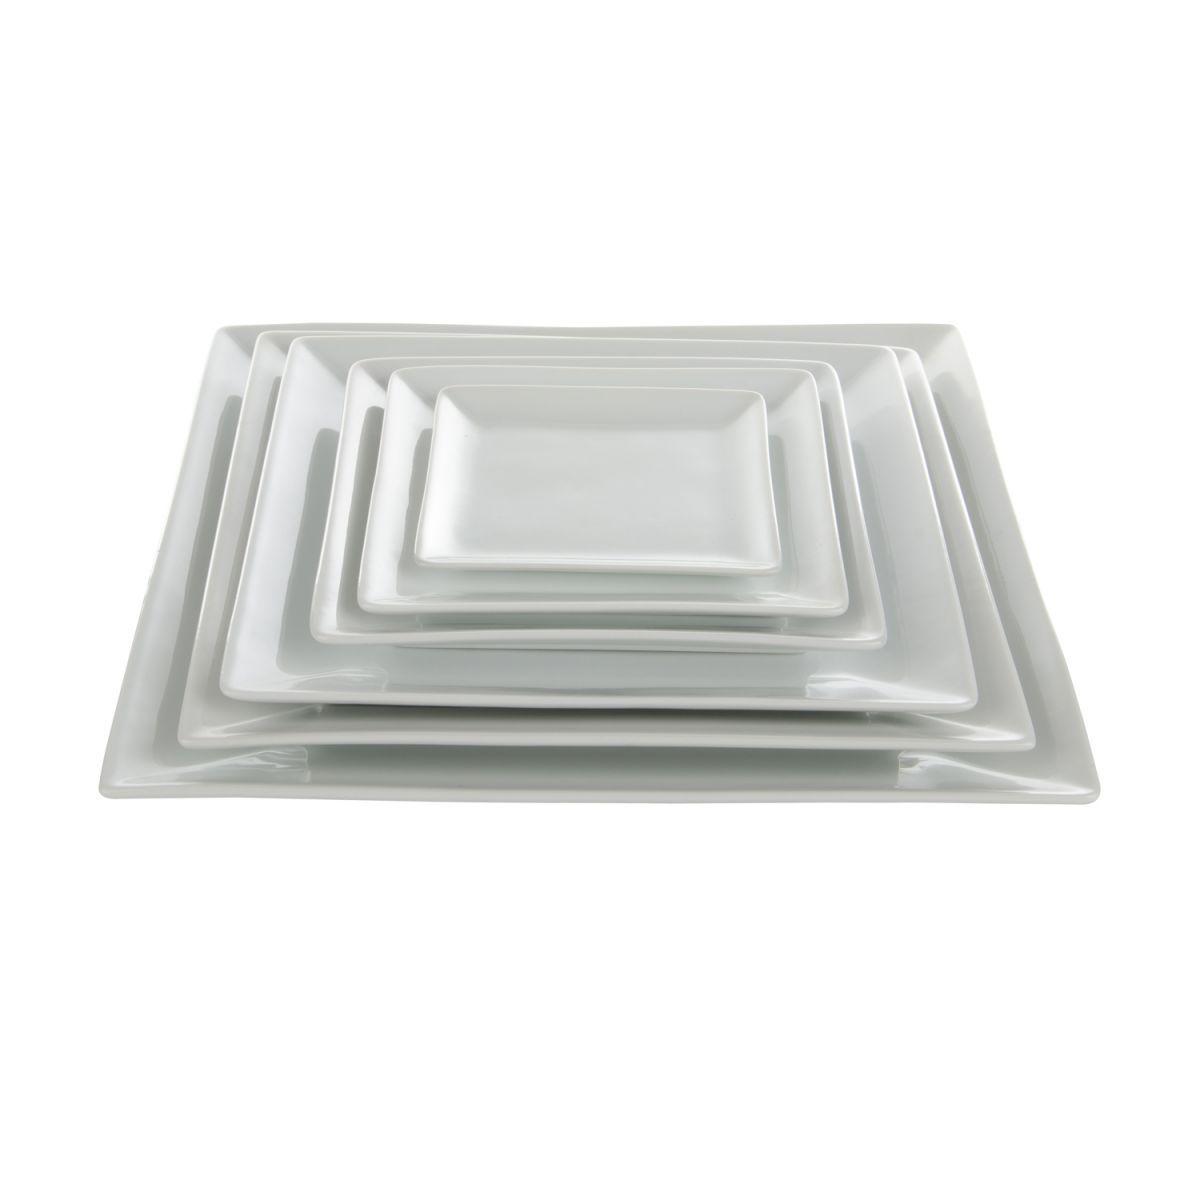 bord vierkant 24 x 24cmbox 6